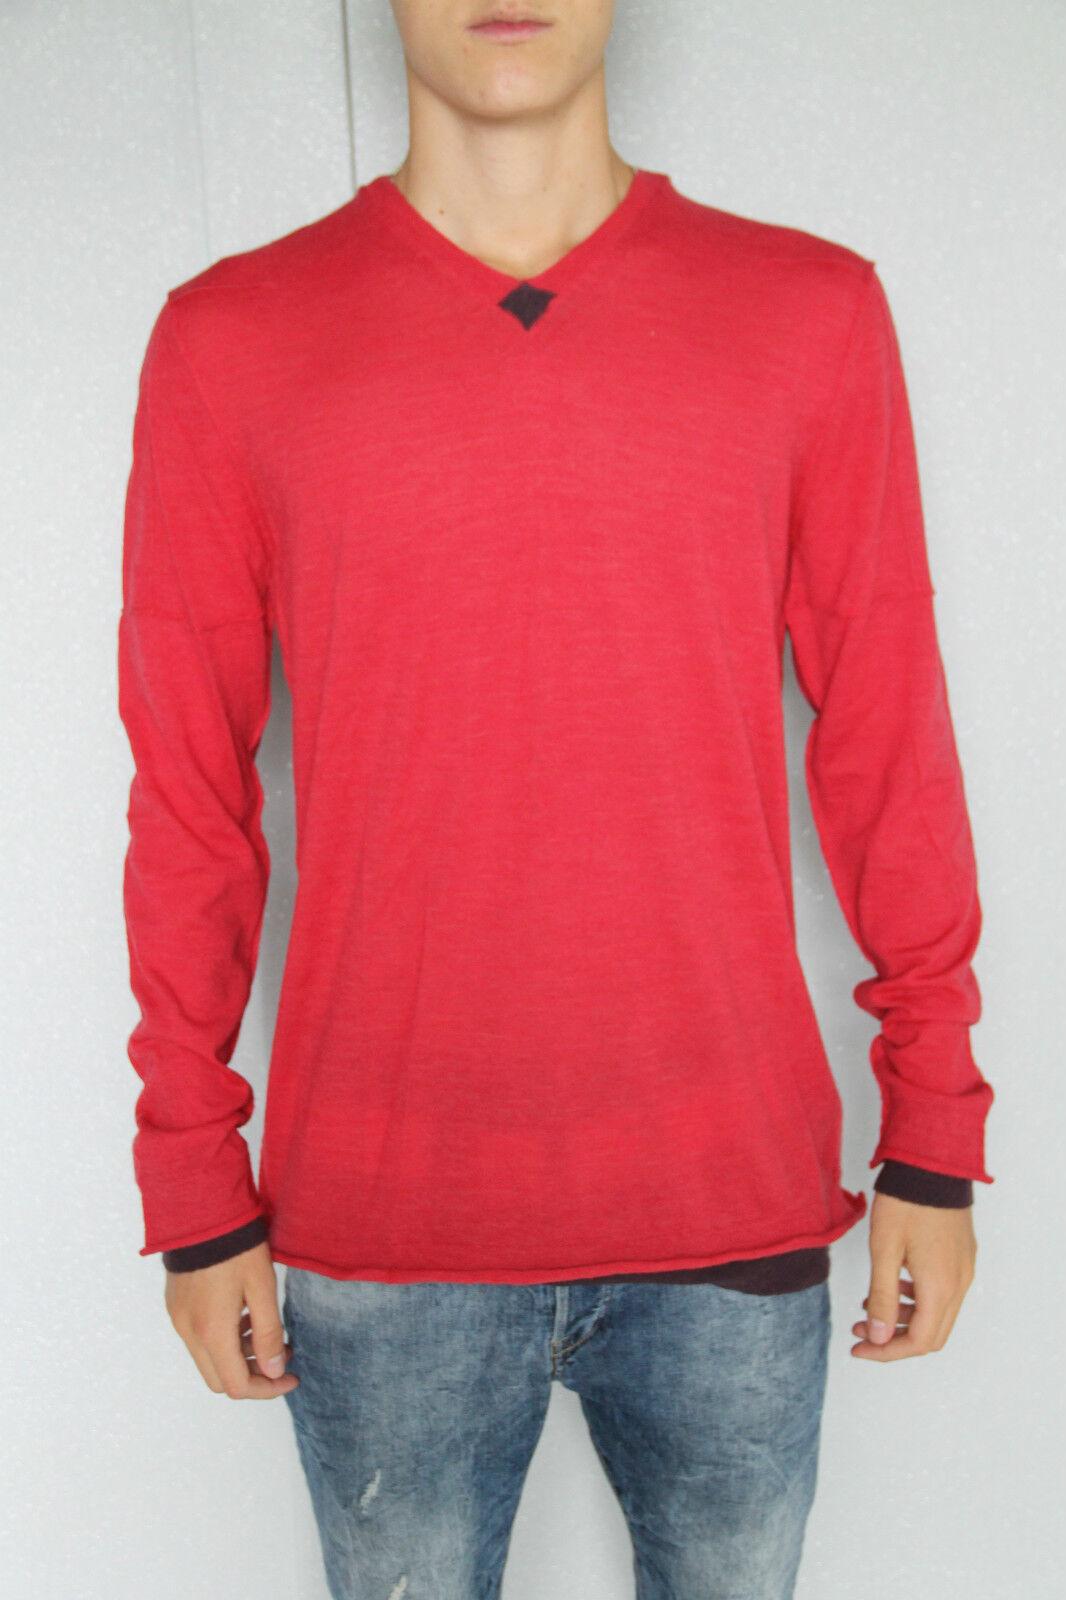 Suéter rojo angora lana de oveja merina extra fina m+F GIRBAUD T. XL /ETIQUETA